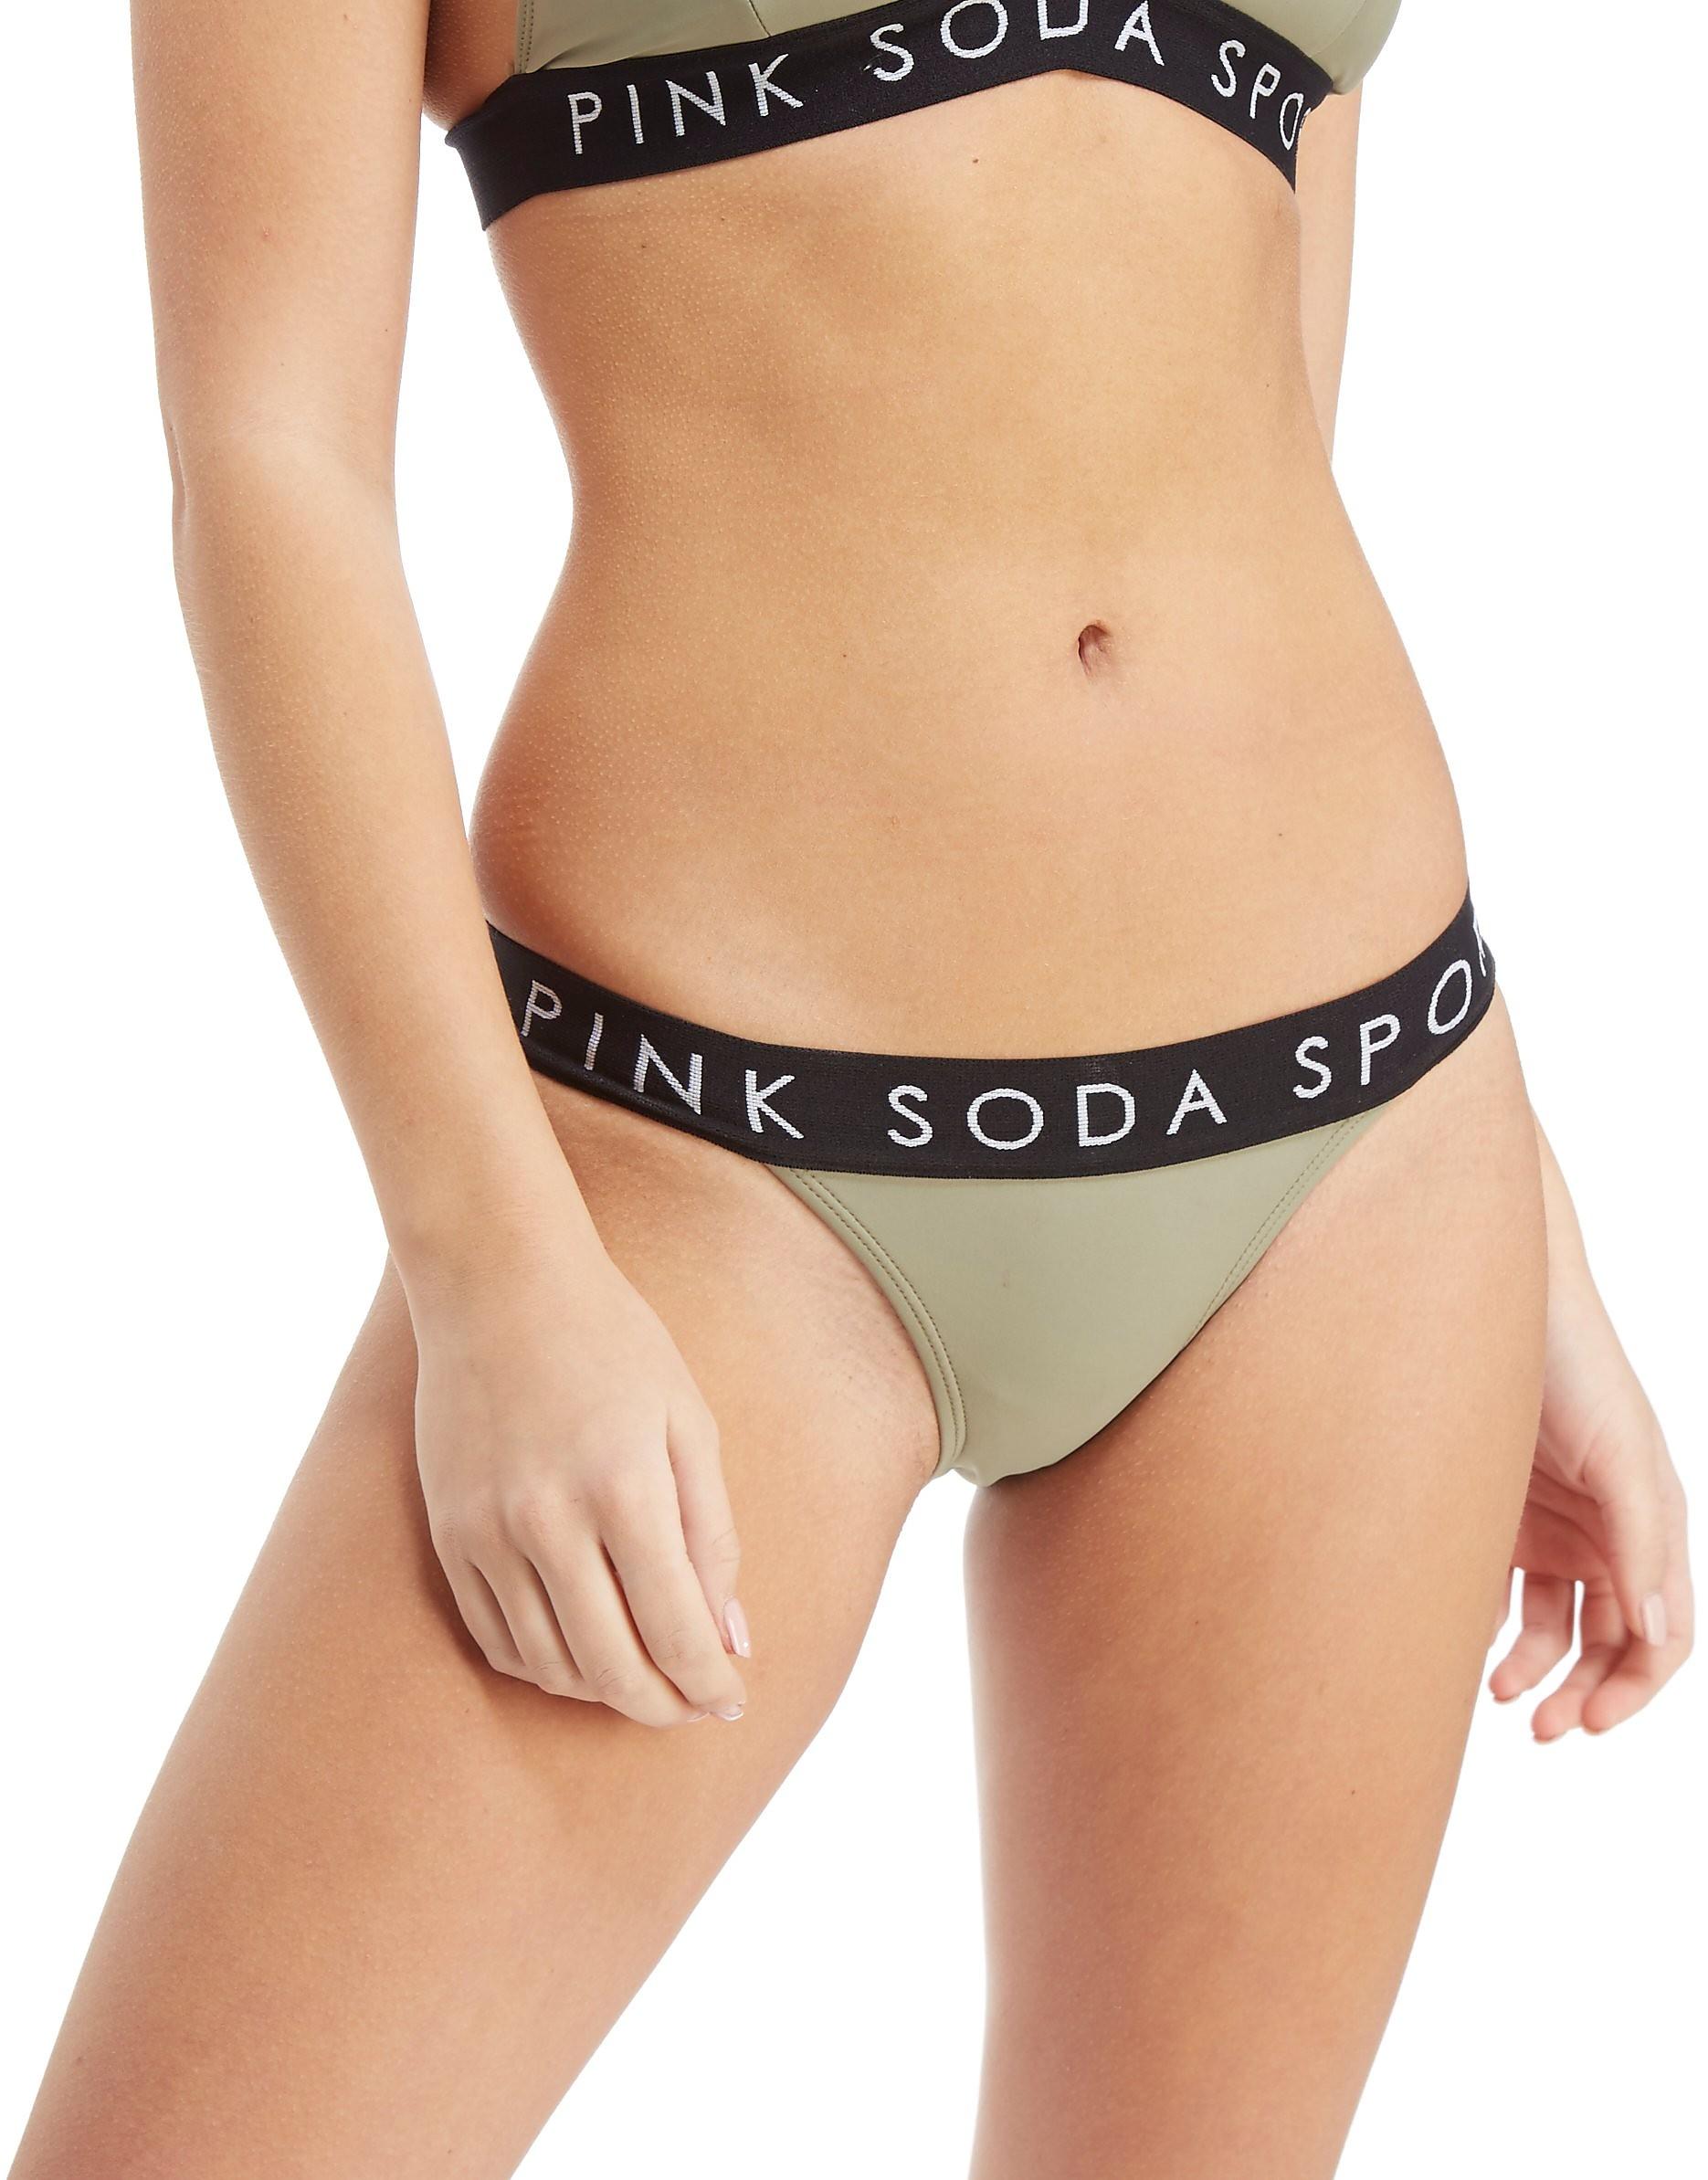 Pink Soda Sport braga de bikini